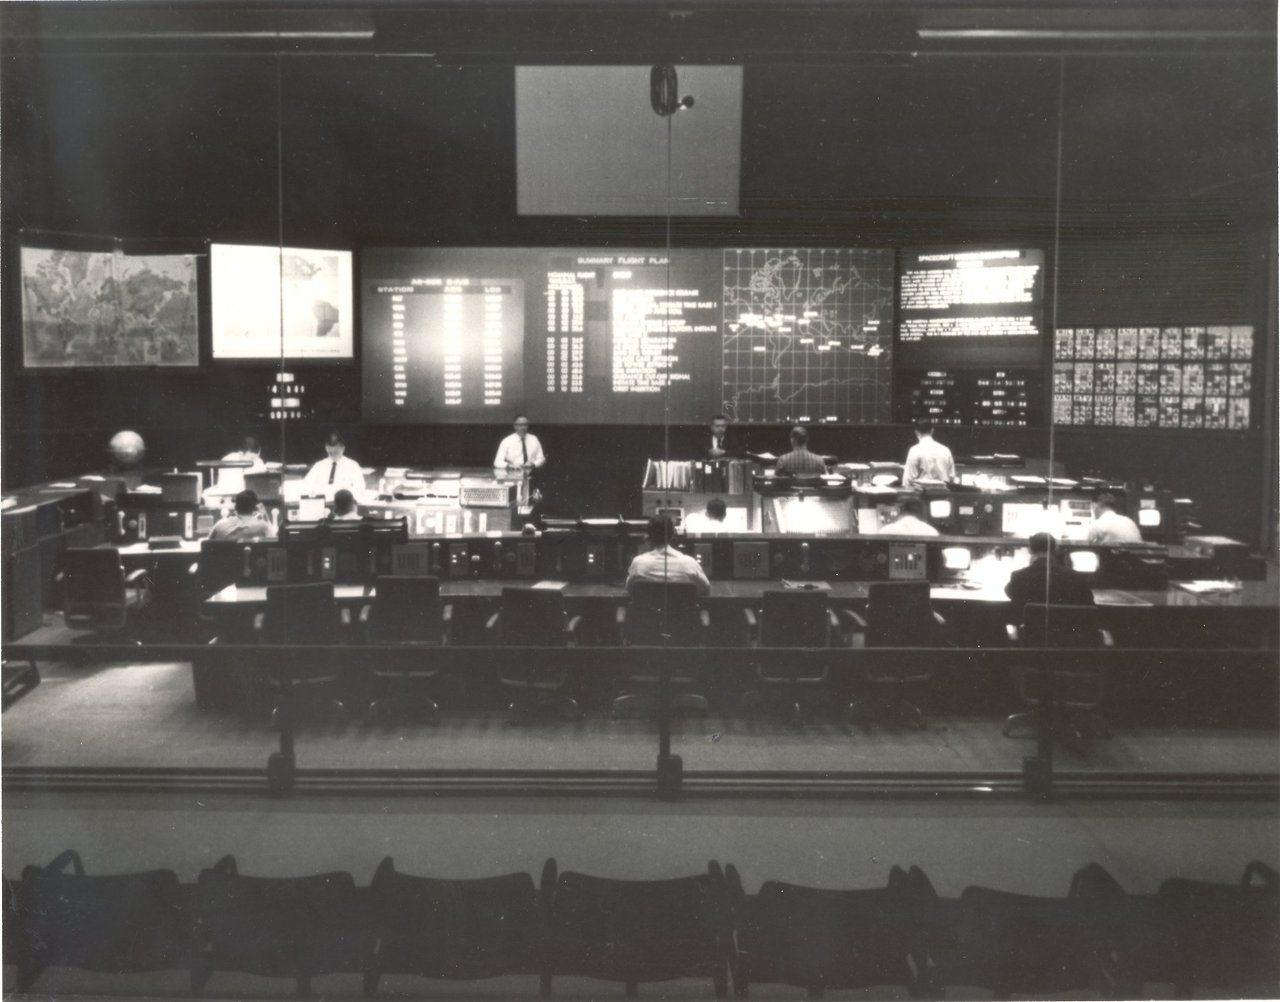 Operation Control, Godddard Space Center